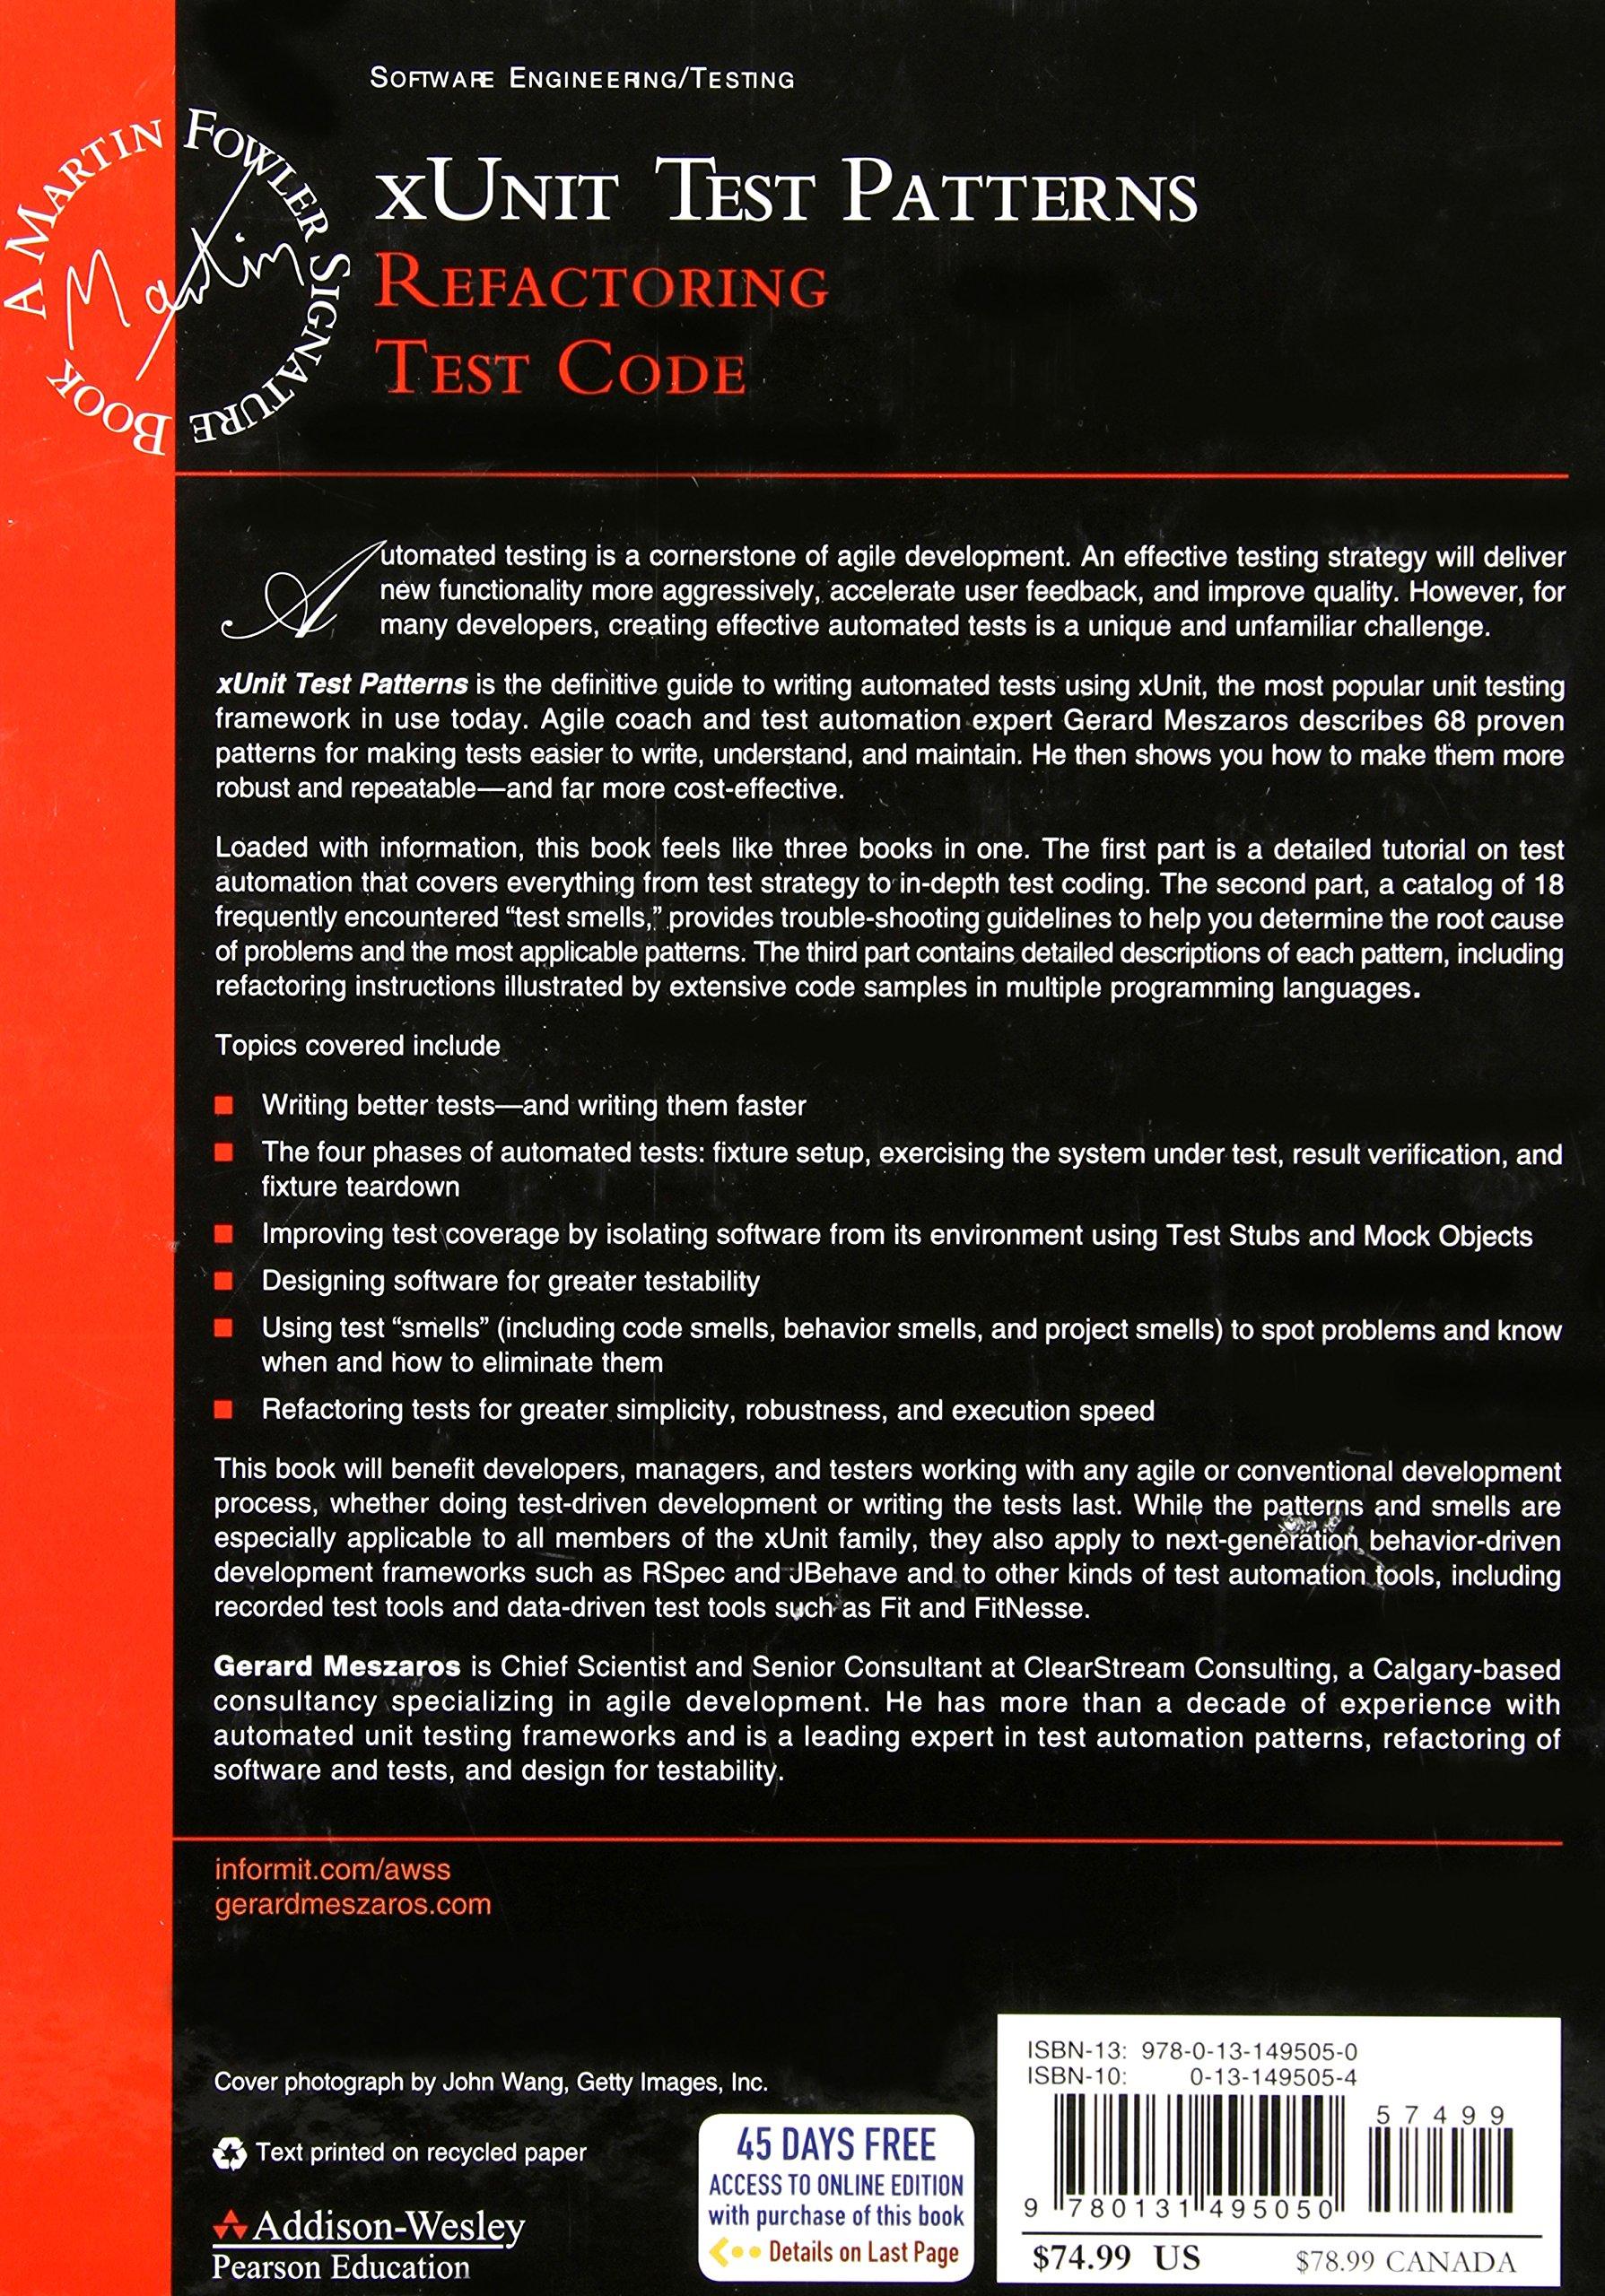 Xunit Test Patterns: Refactoring Test Code - Livros na Amazon Brasil-  0076092037590